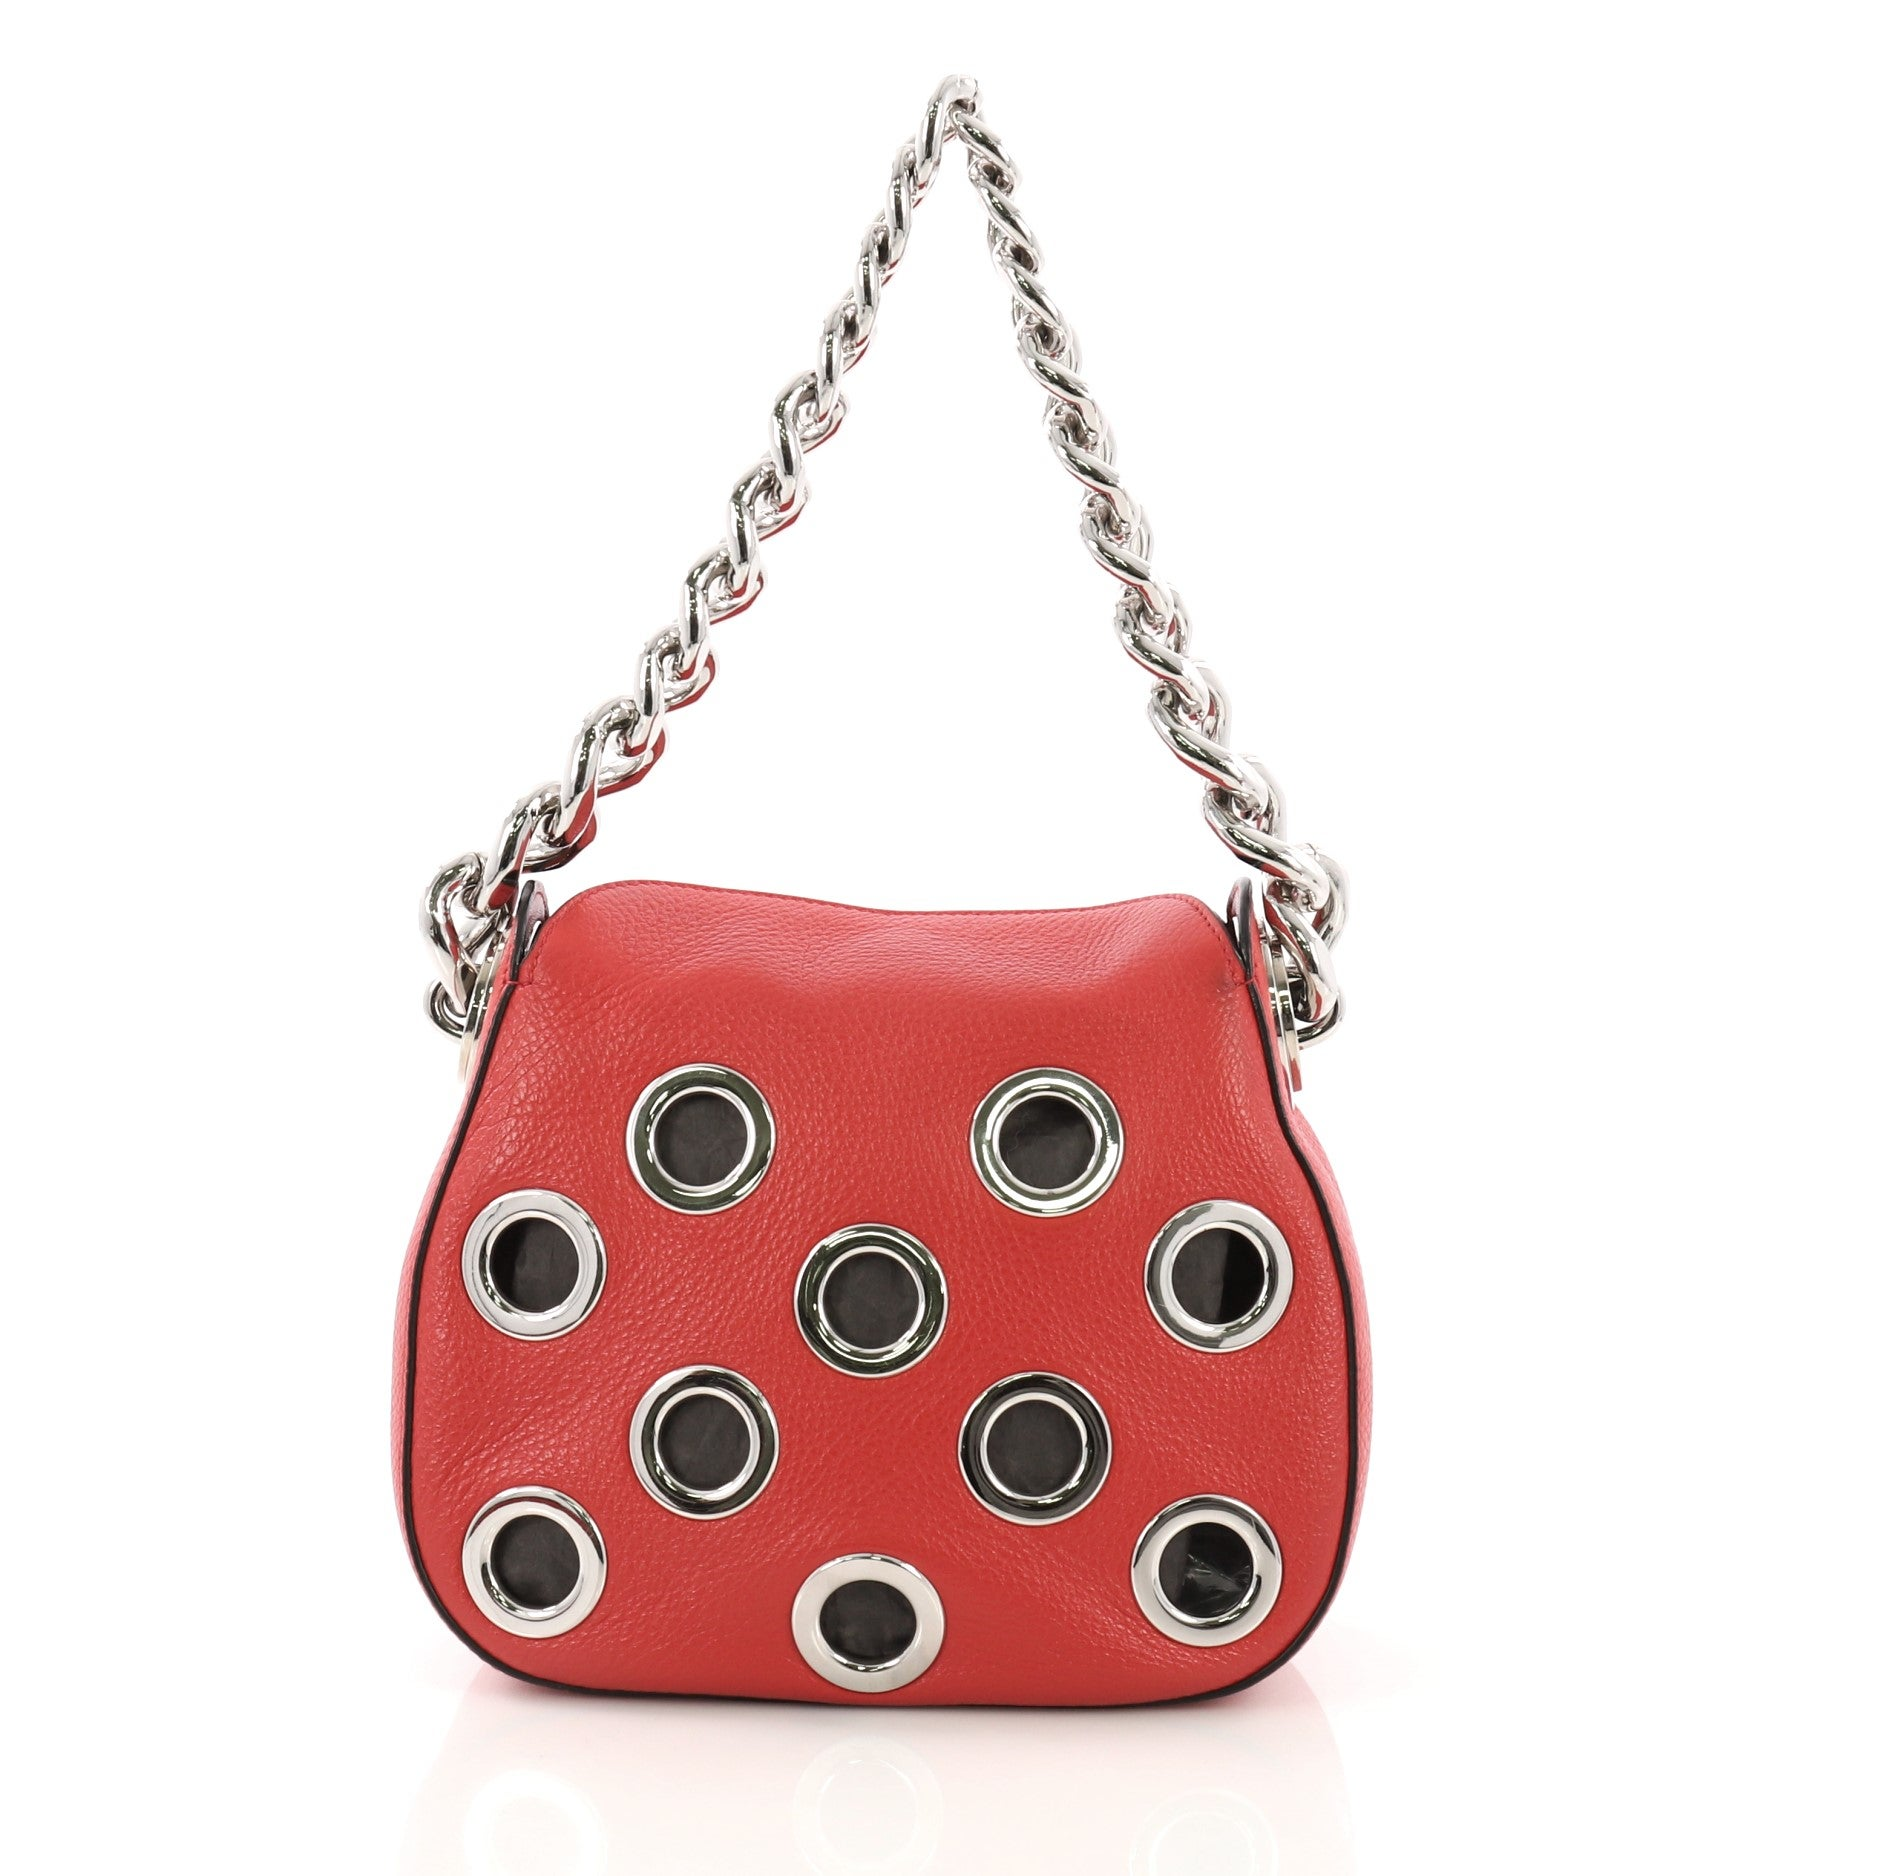 f897a4c39a Prada Grommet Chain Hobo Vitello Daino Small For Sale at 1stdibs